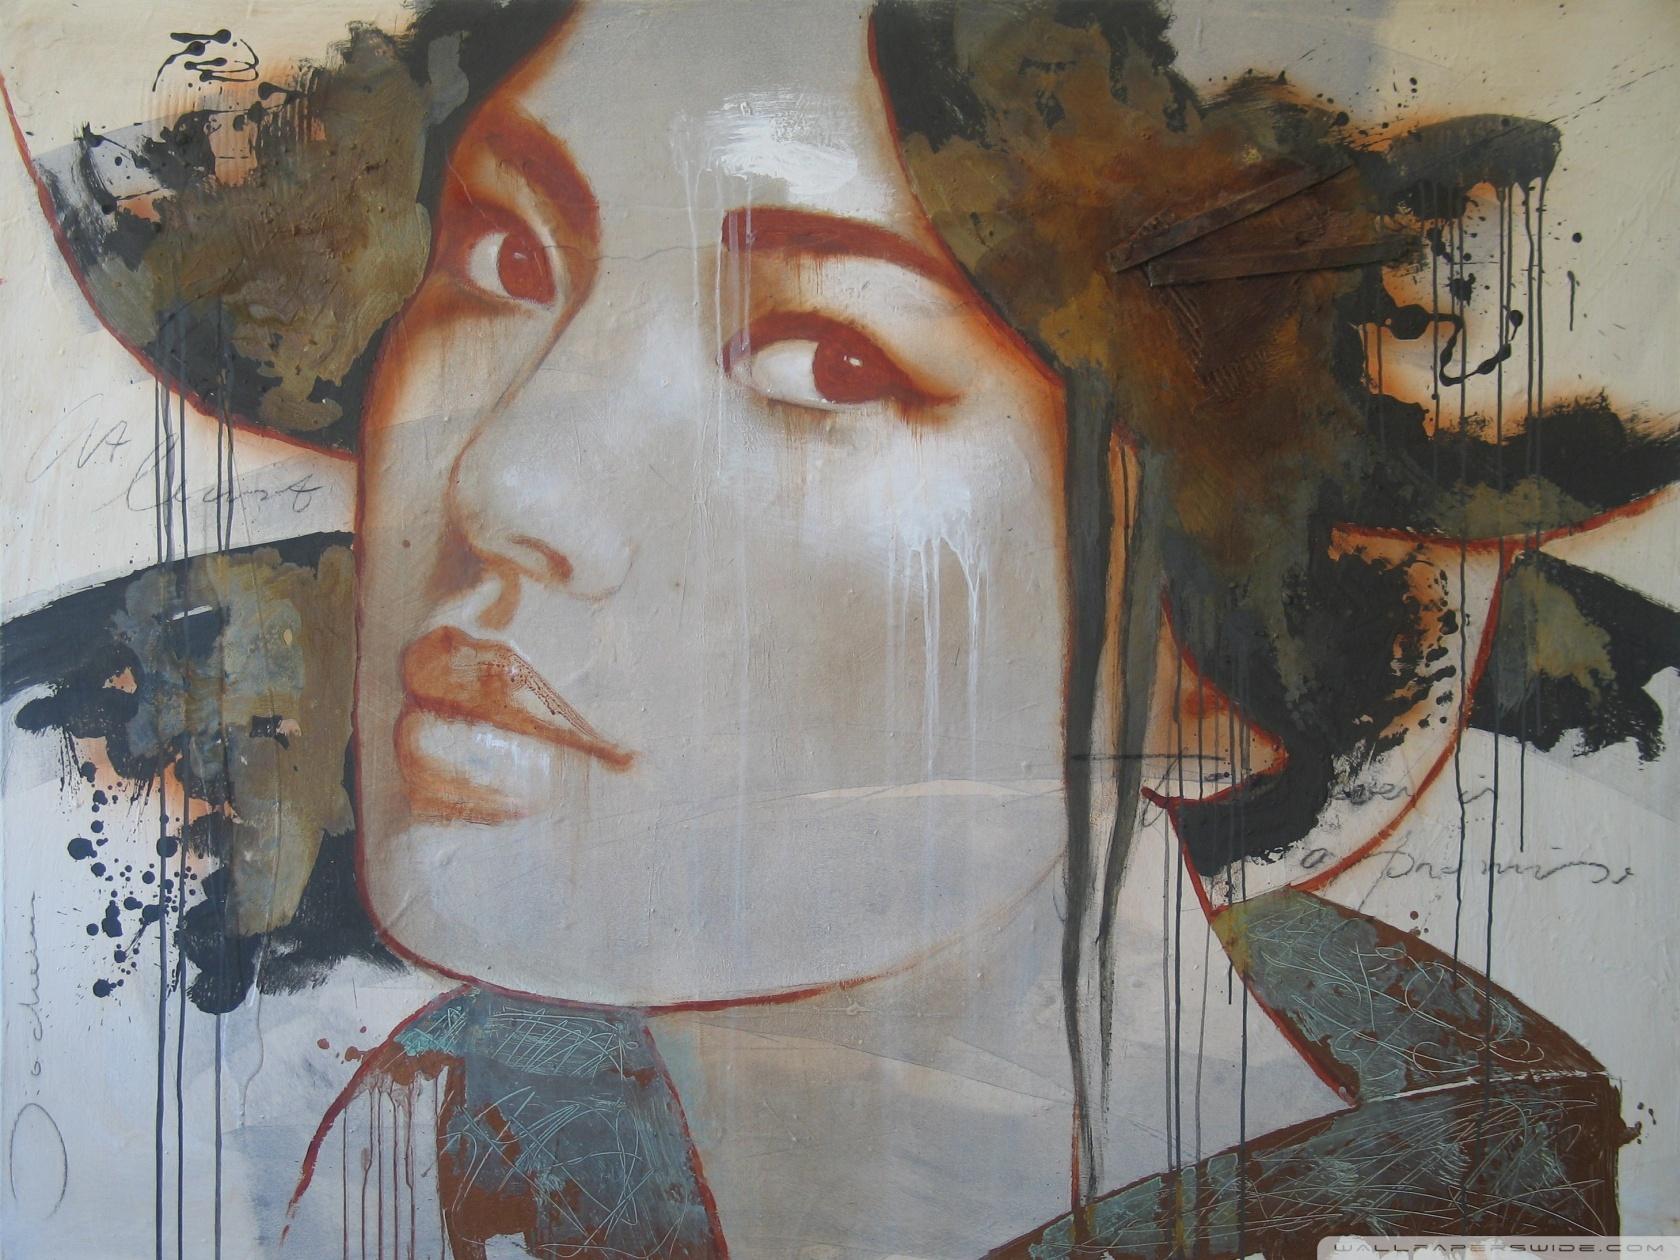 Woman Portrait Graffiti 4K HD Desktop Wallpaper for 4K